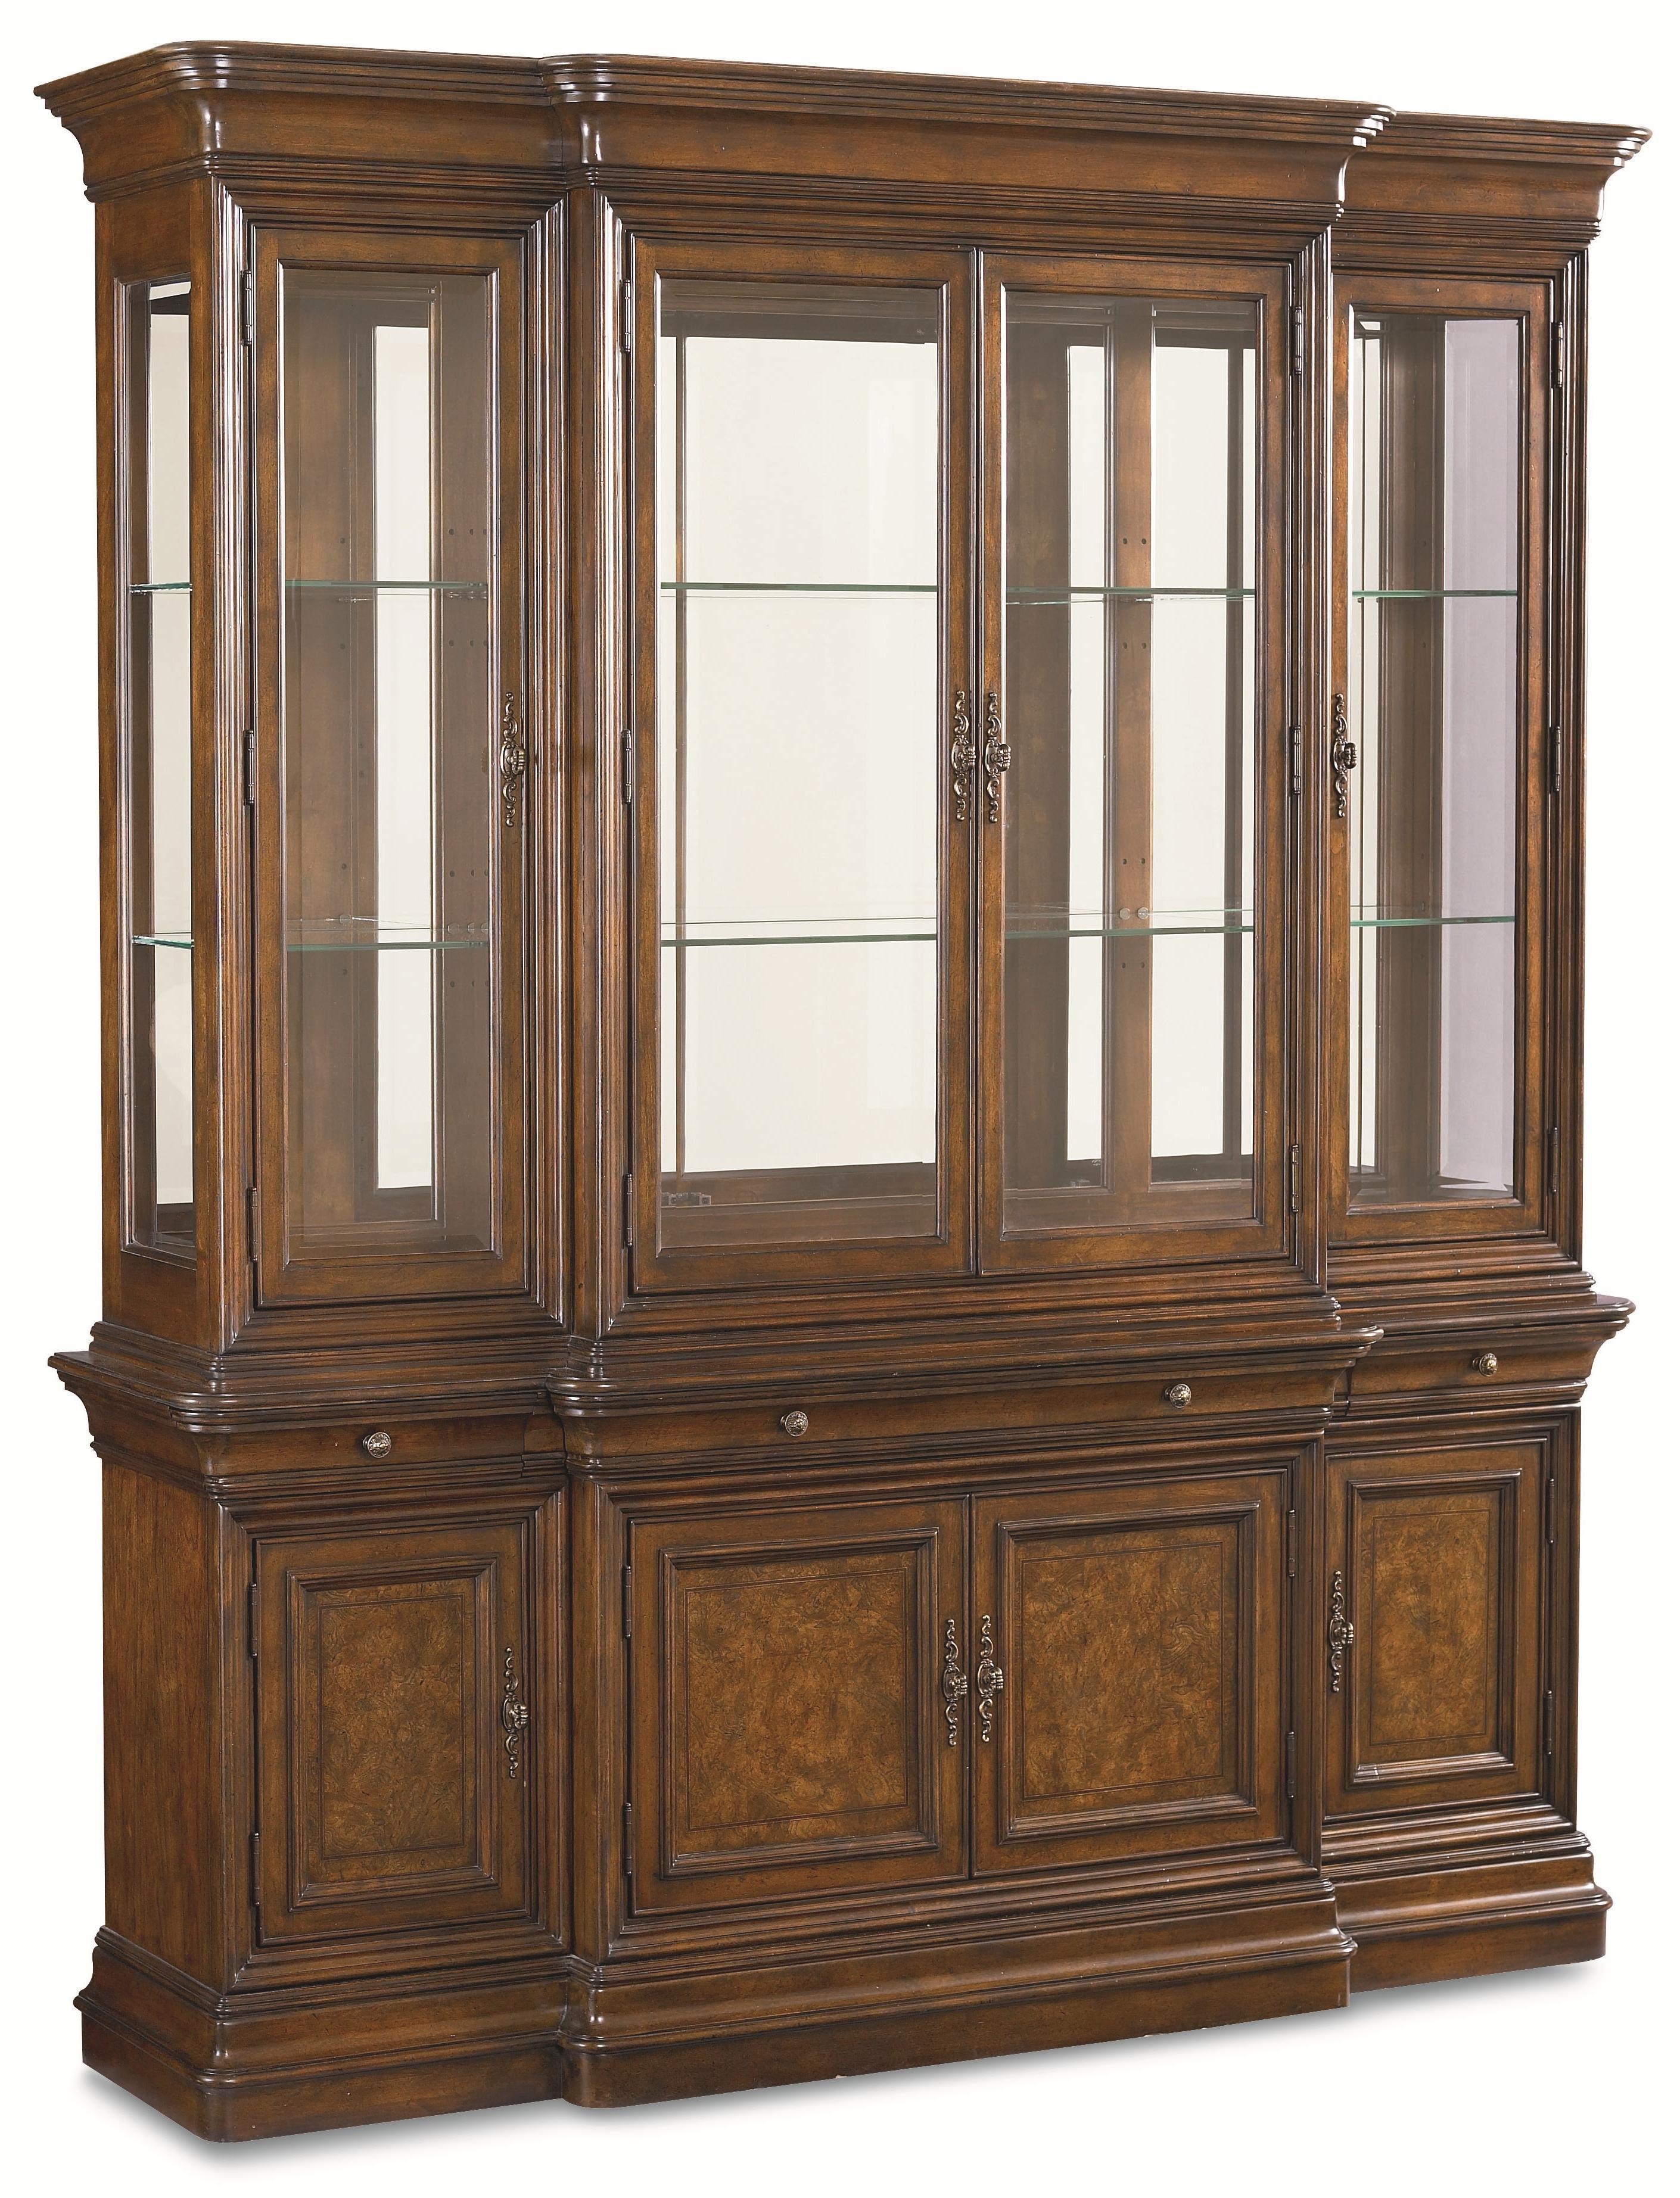 Thomasville deschanel 46721 435 china cabinet w 3 for Thomasville lights